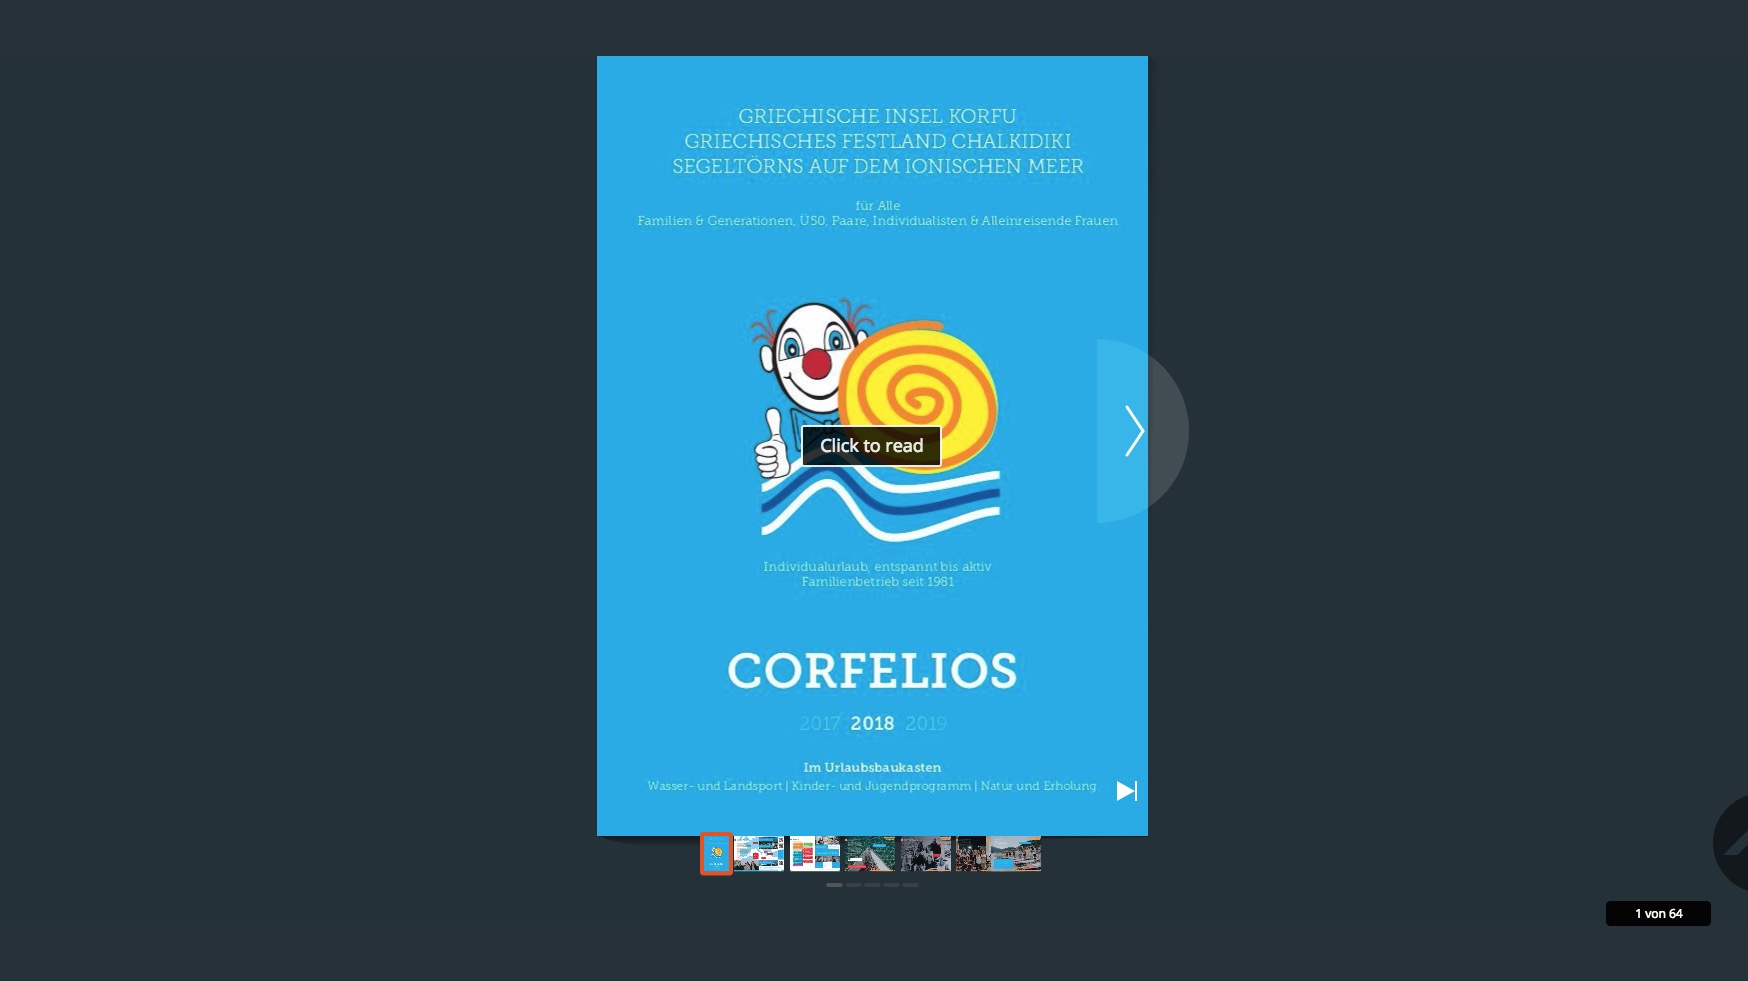 Corfelios Online Blätterkatalog 2018-2019